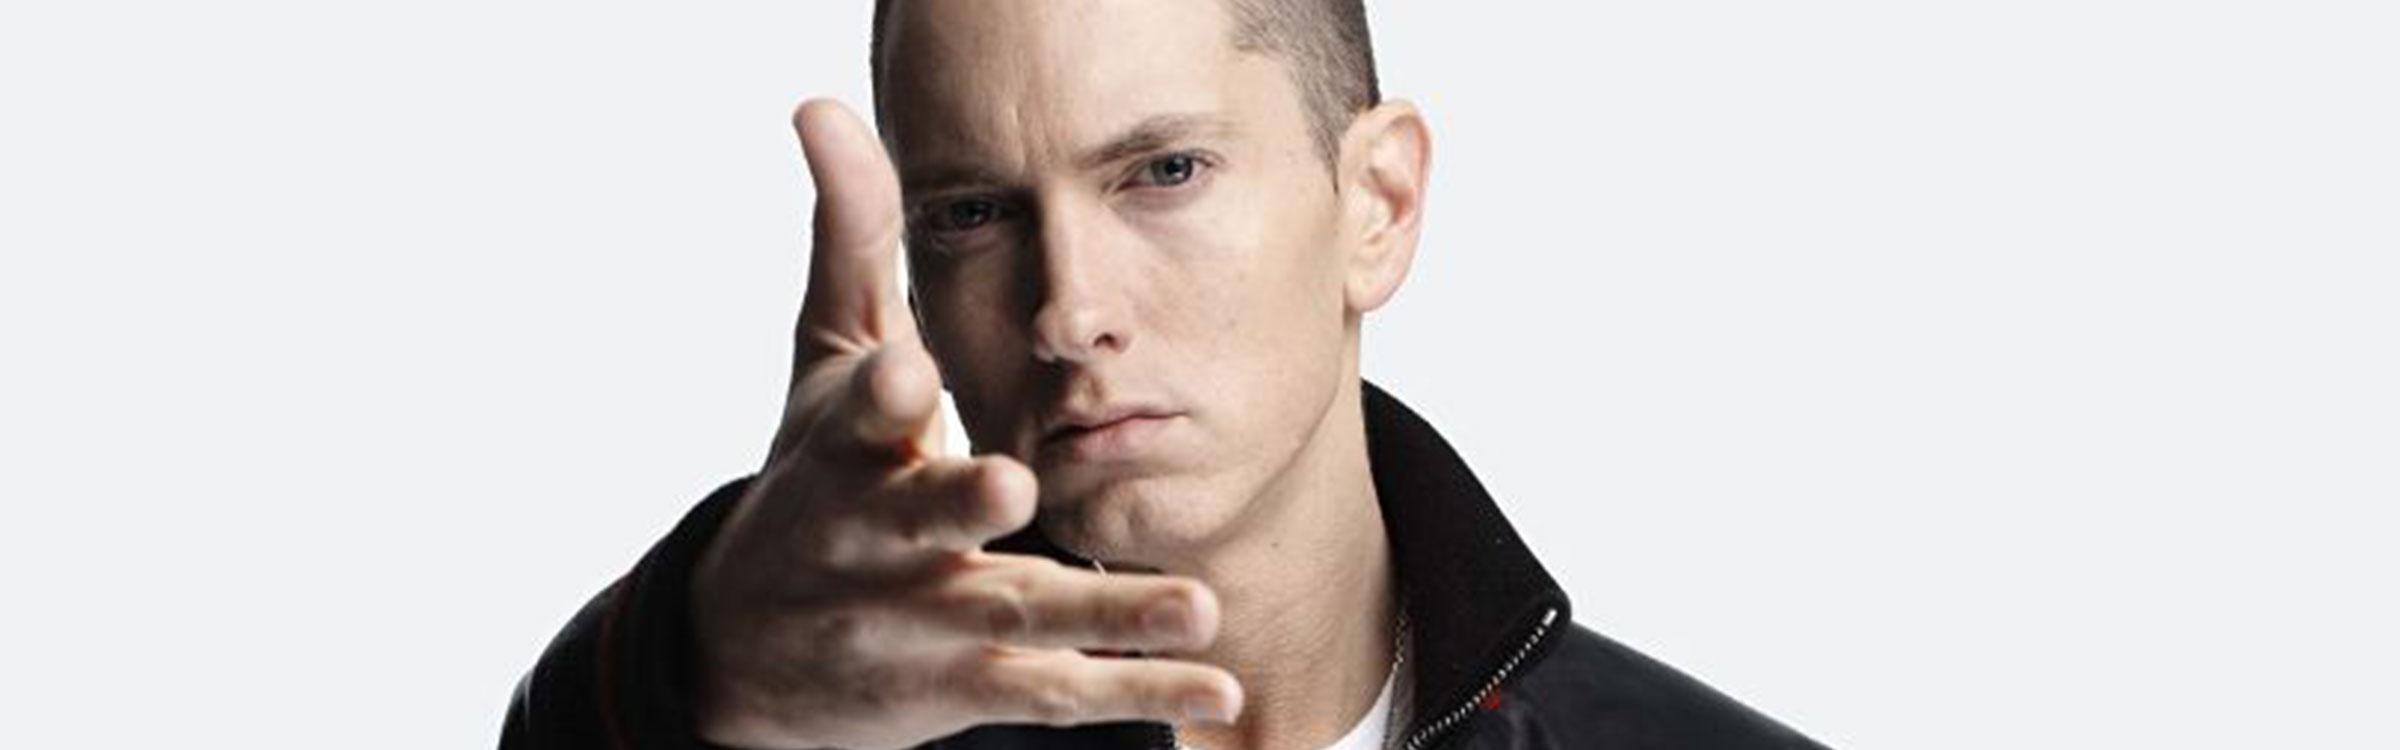 Eminemheader